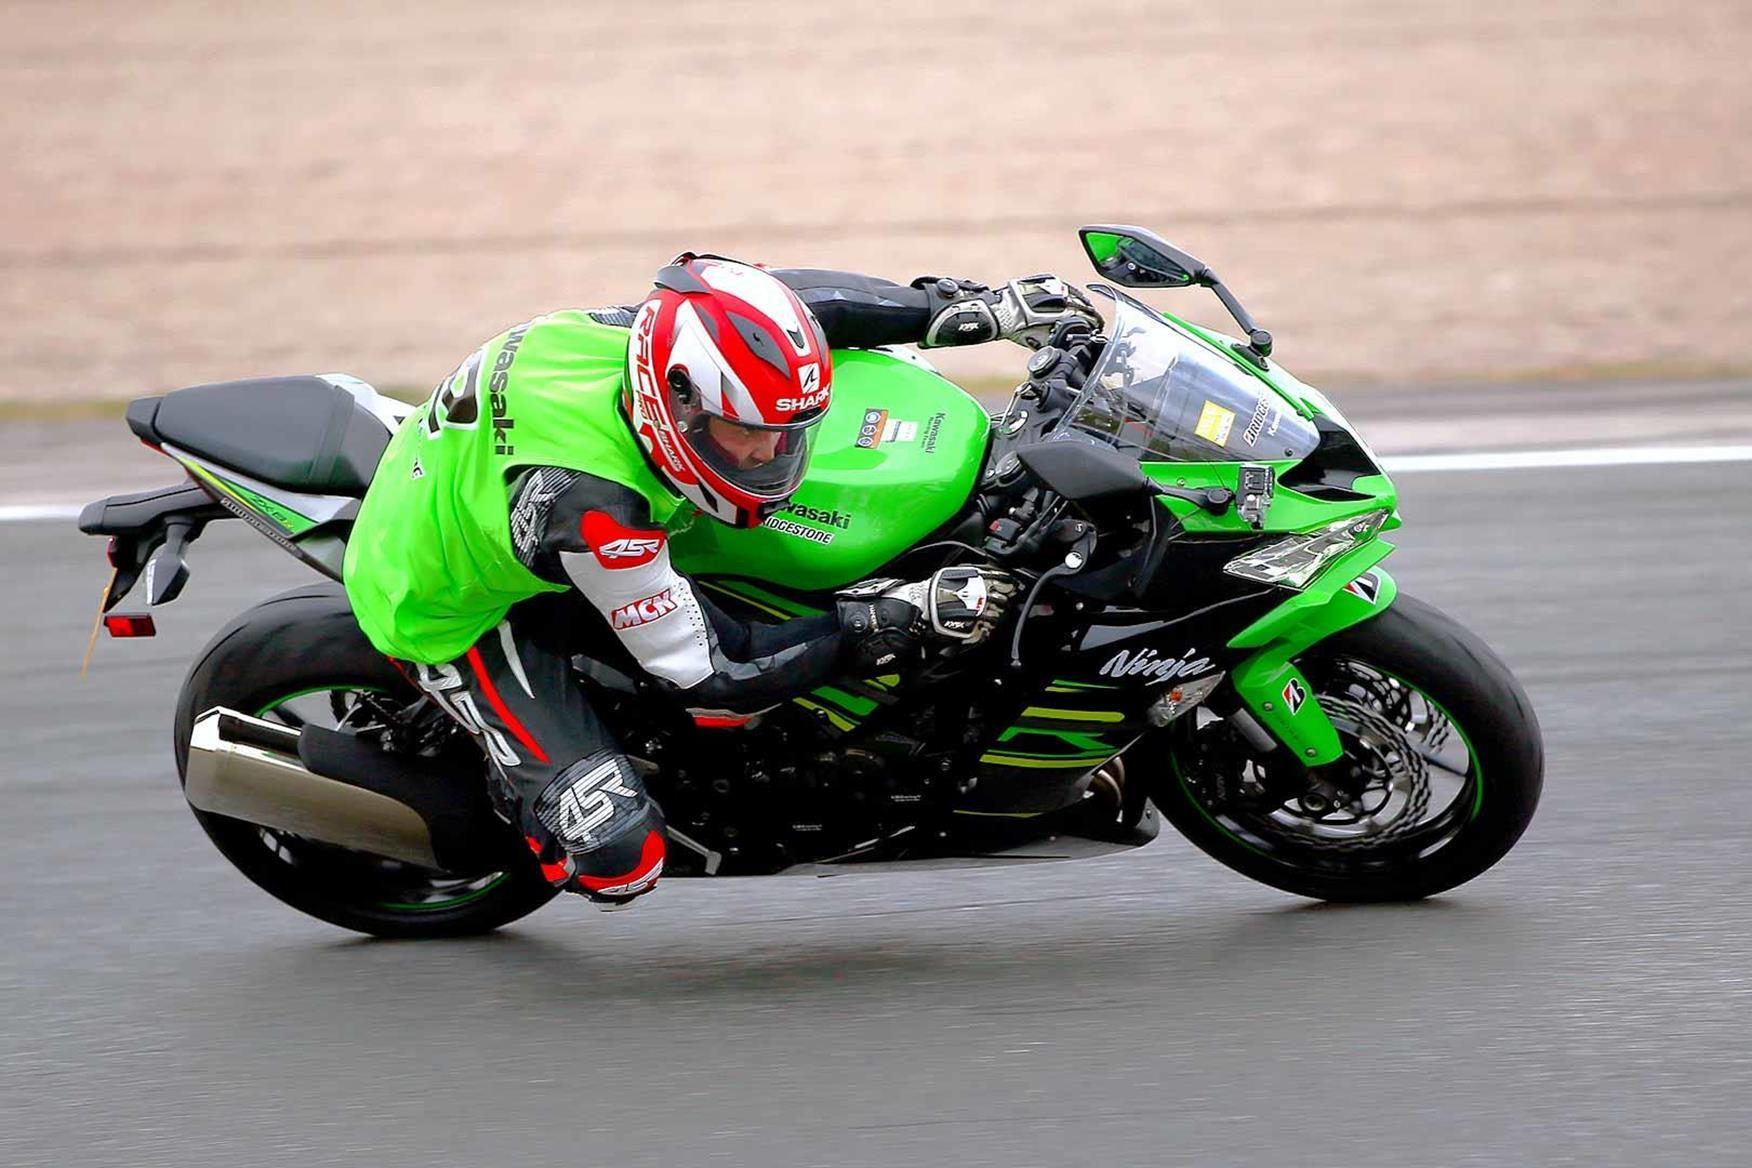 2019 Kawasaki ZX-6R cornering with MCN rider on top